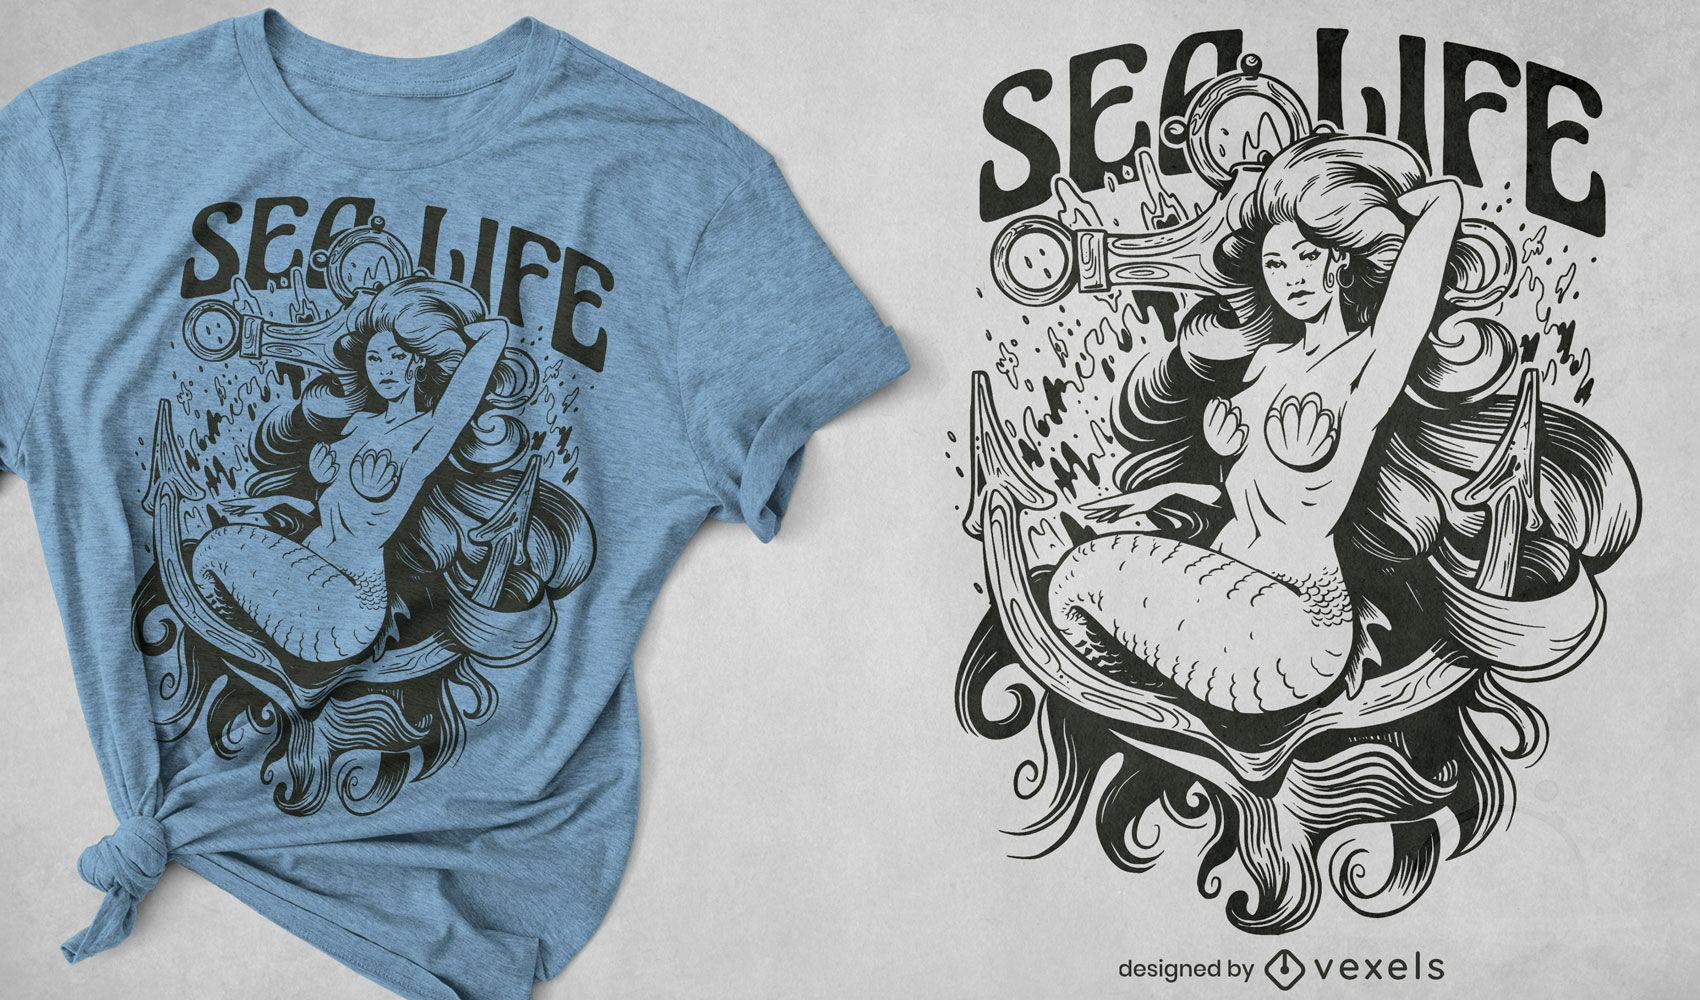 Mythologische Meerjungfrau auf Anker-T-Shirt-Design